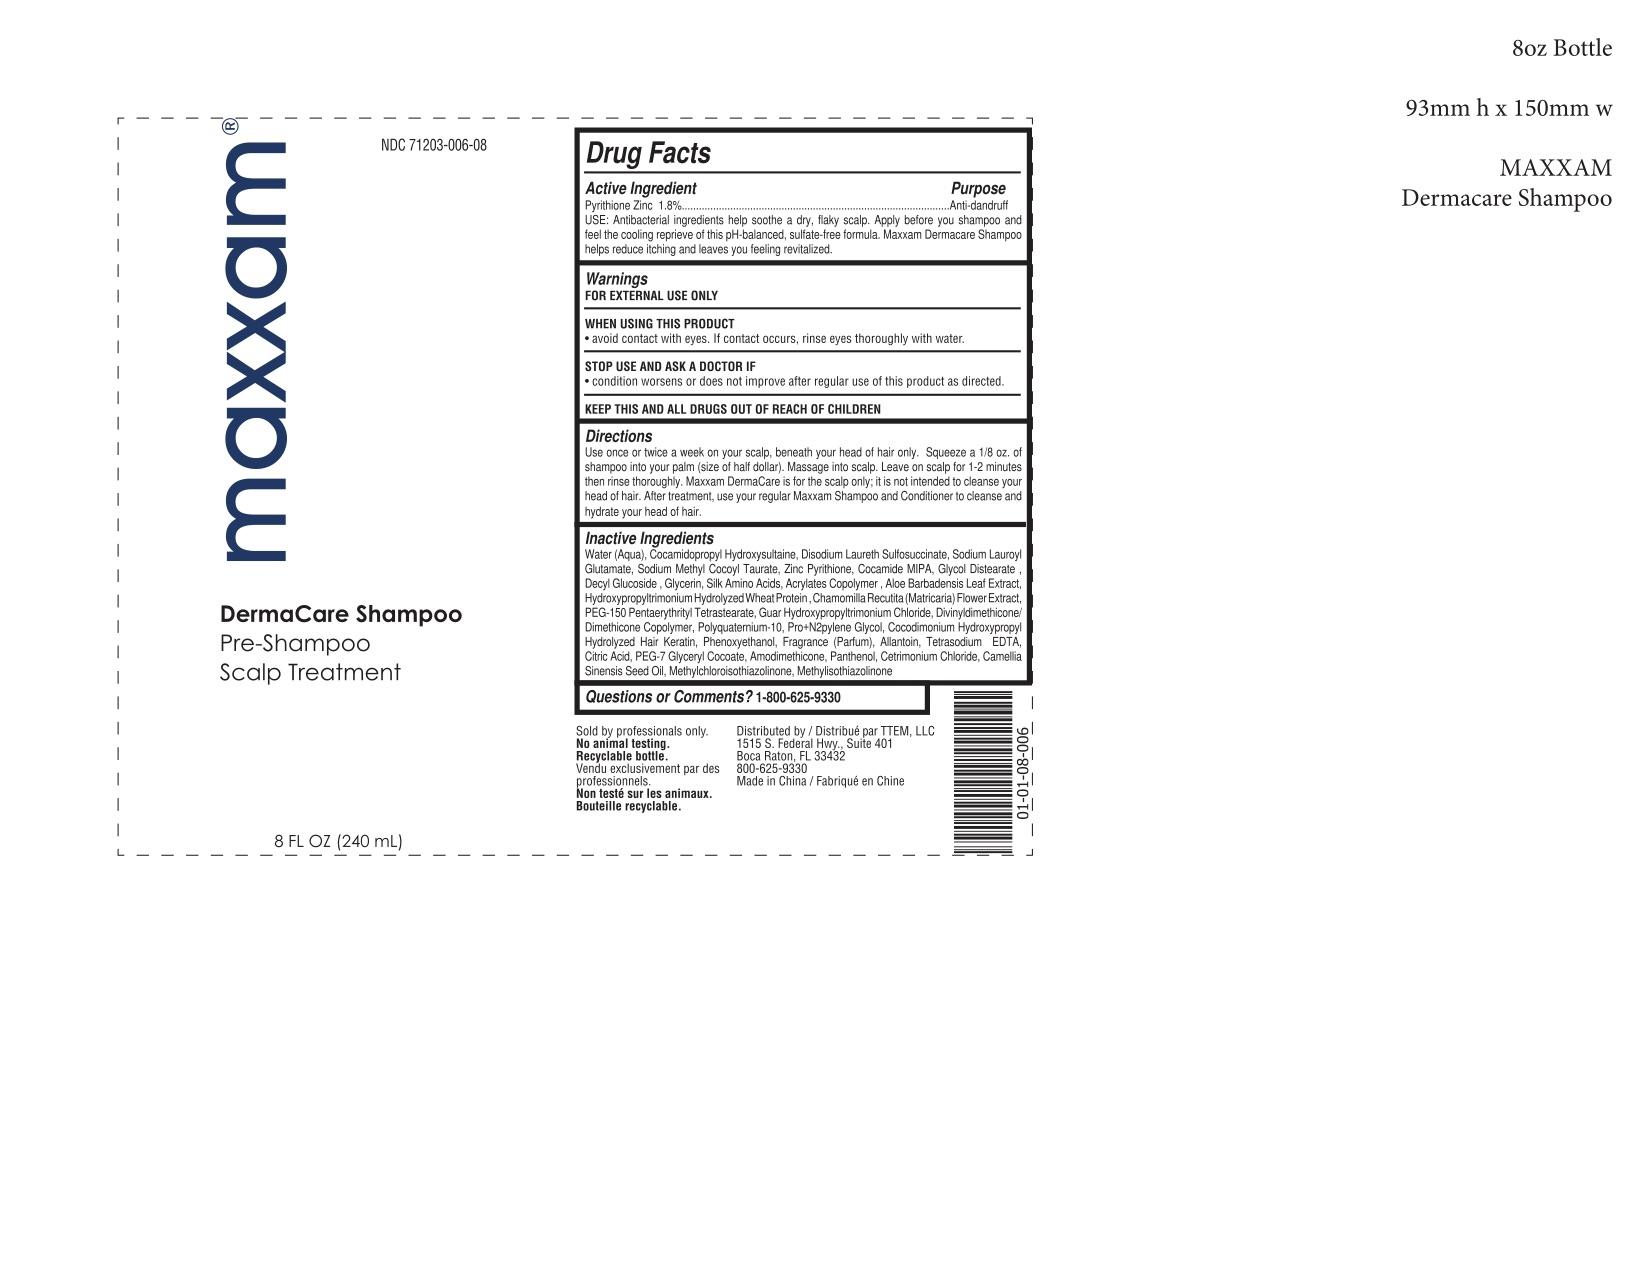 Maxxam Dermacare Pre-shampoo Scalp Treatment | Pyrithione Zinc 1.8 G In 100 Ml Breastfeeding